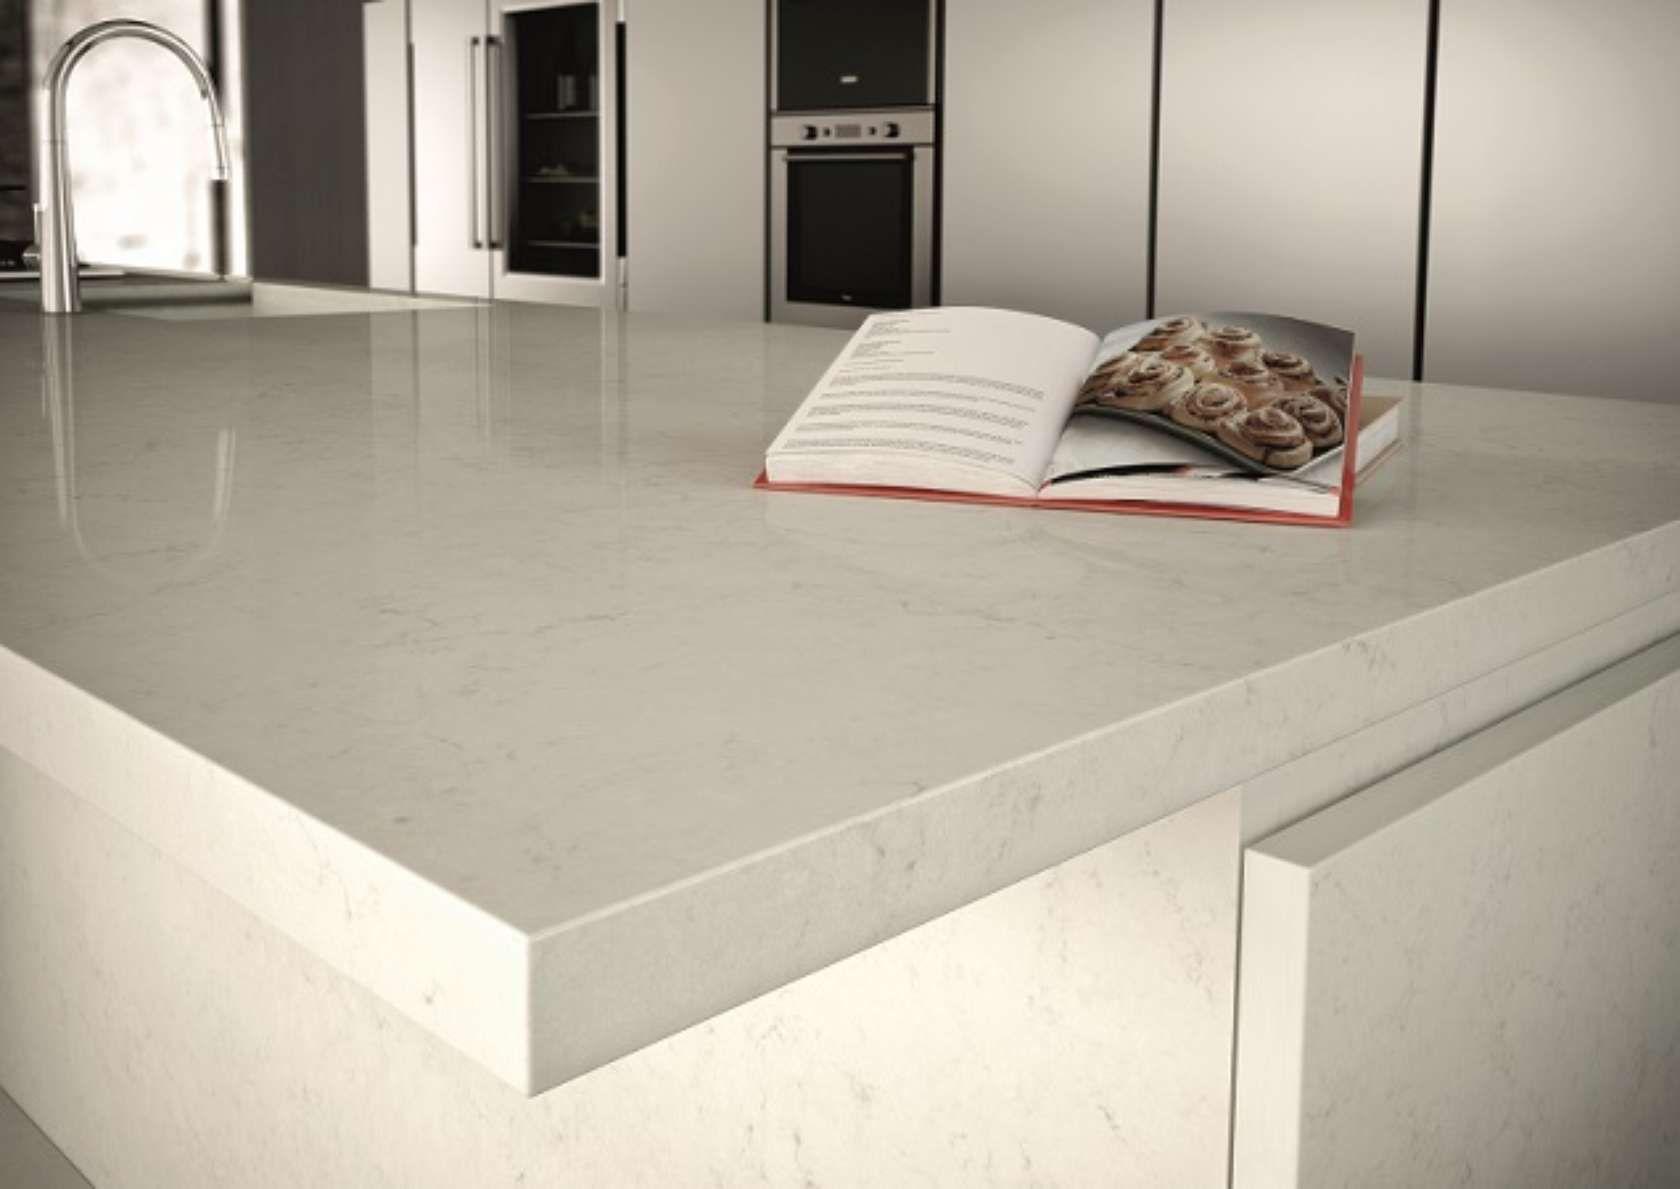 - Caesarstone Frosty Carrina 5141 - Tiles, Worktops, Flooring & Wall